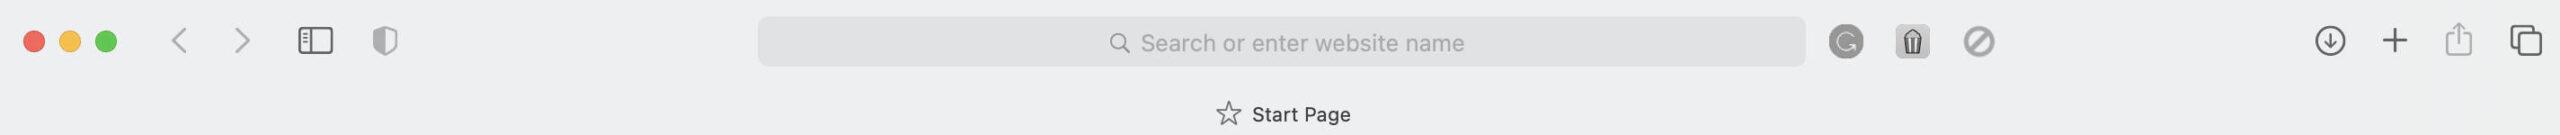 Safari's toolbar.